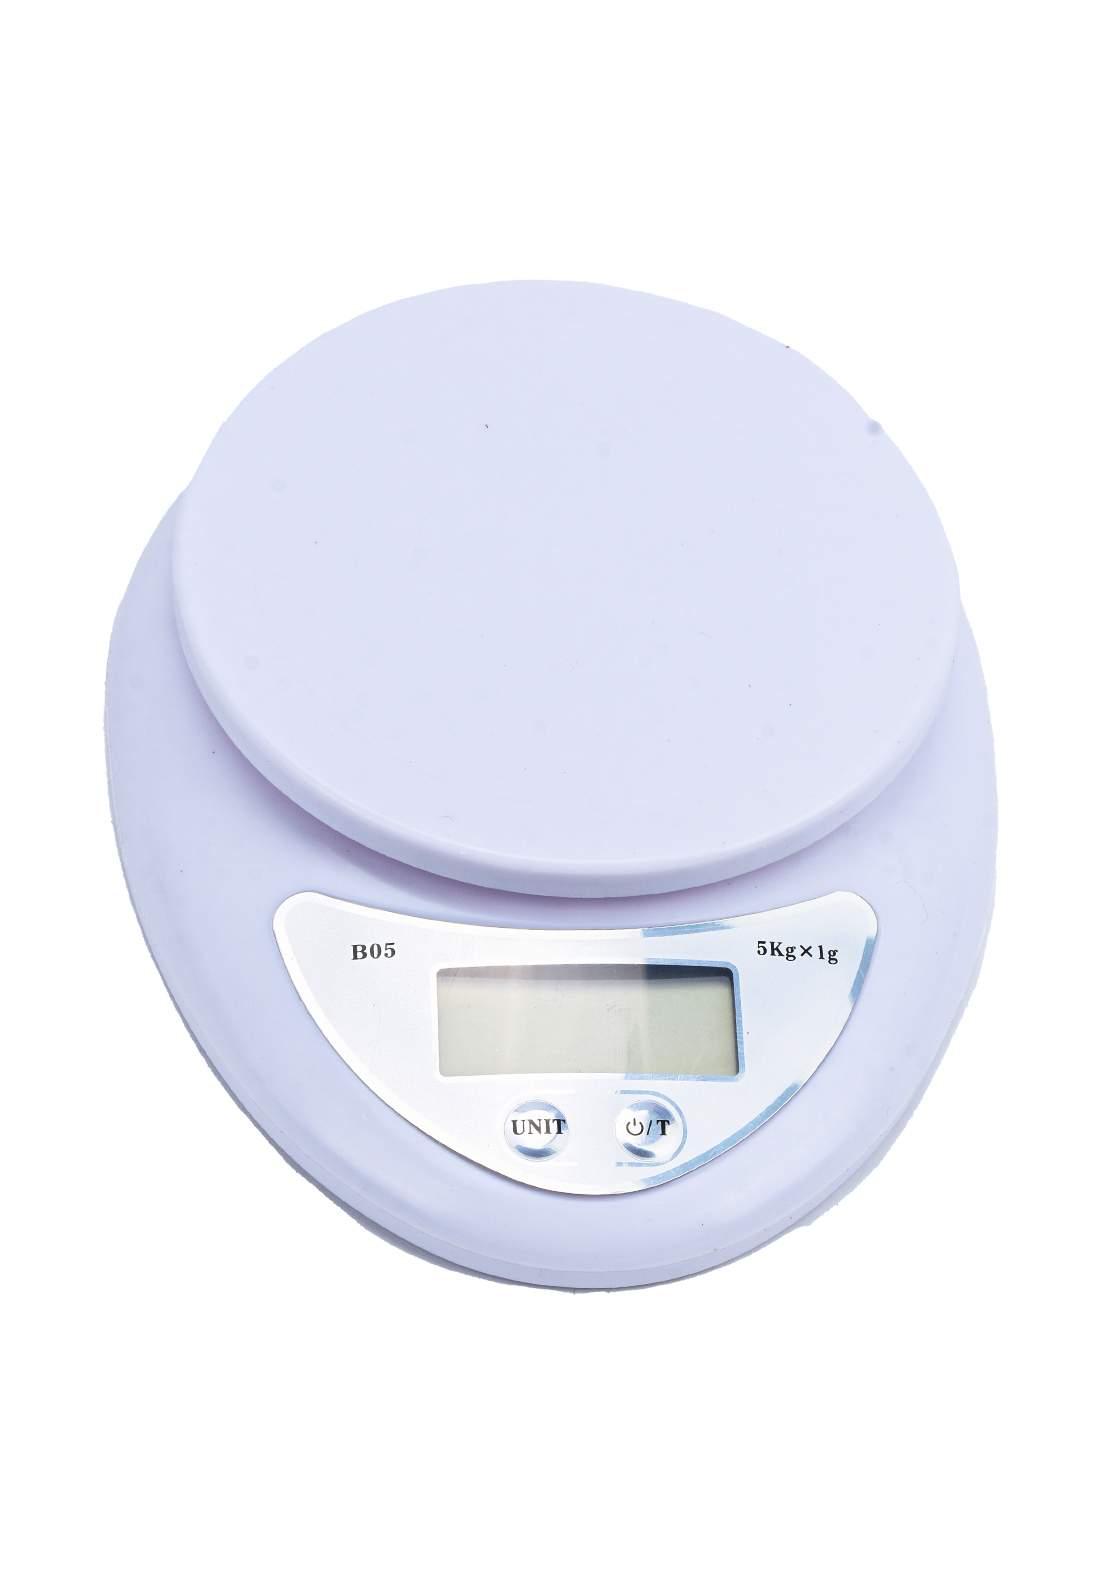 Eiectronic Kitchen Scale ميزان الالكتروني